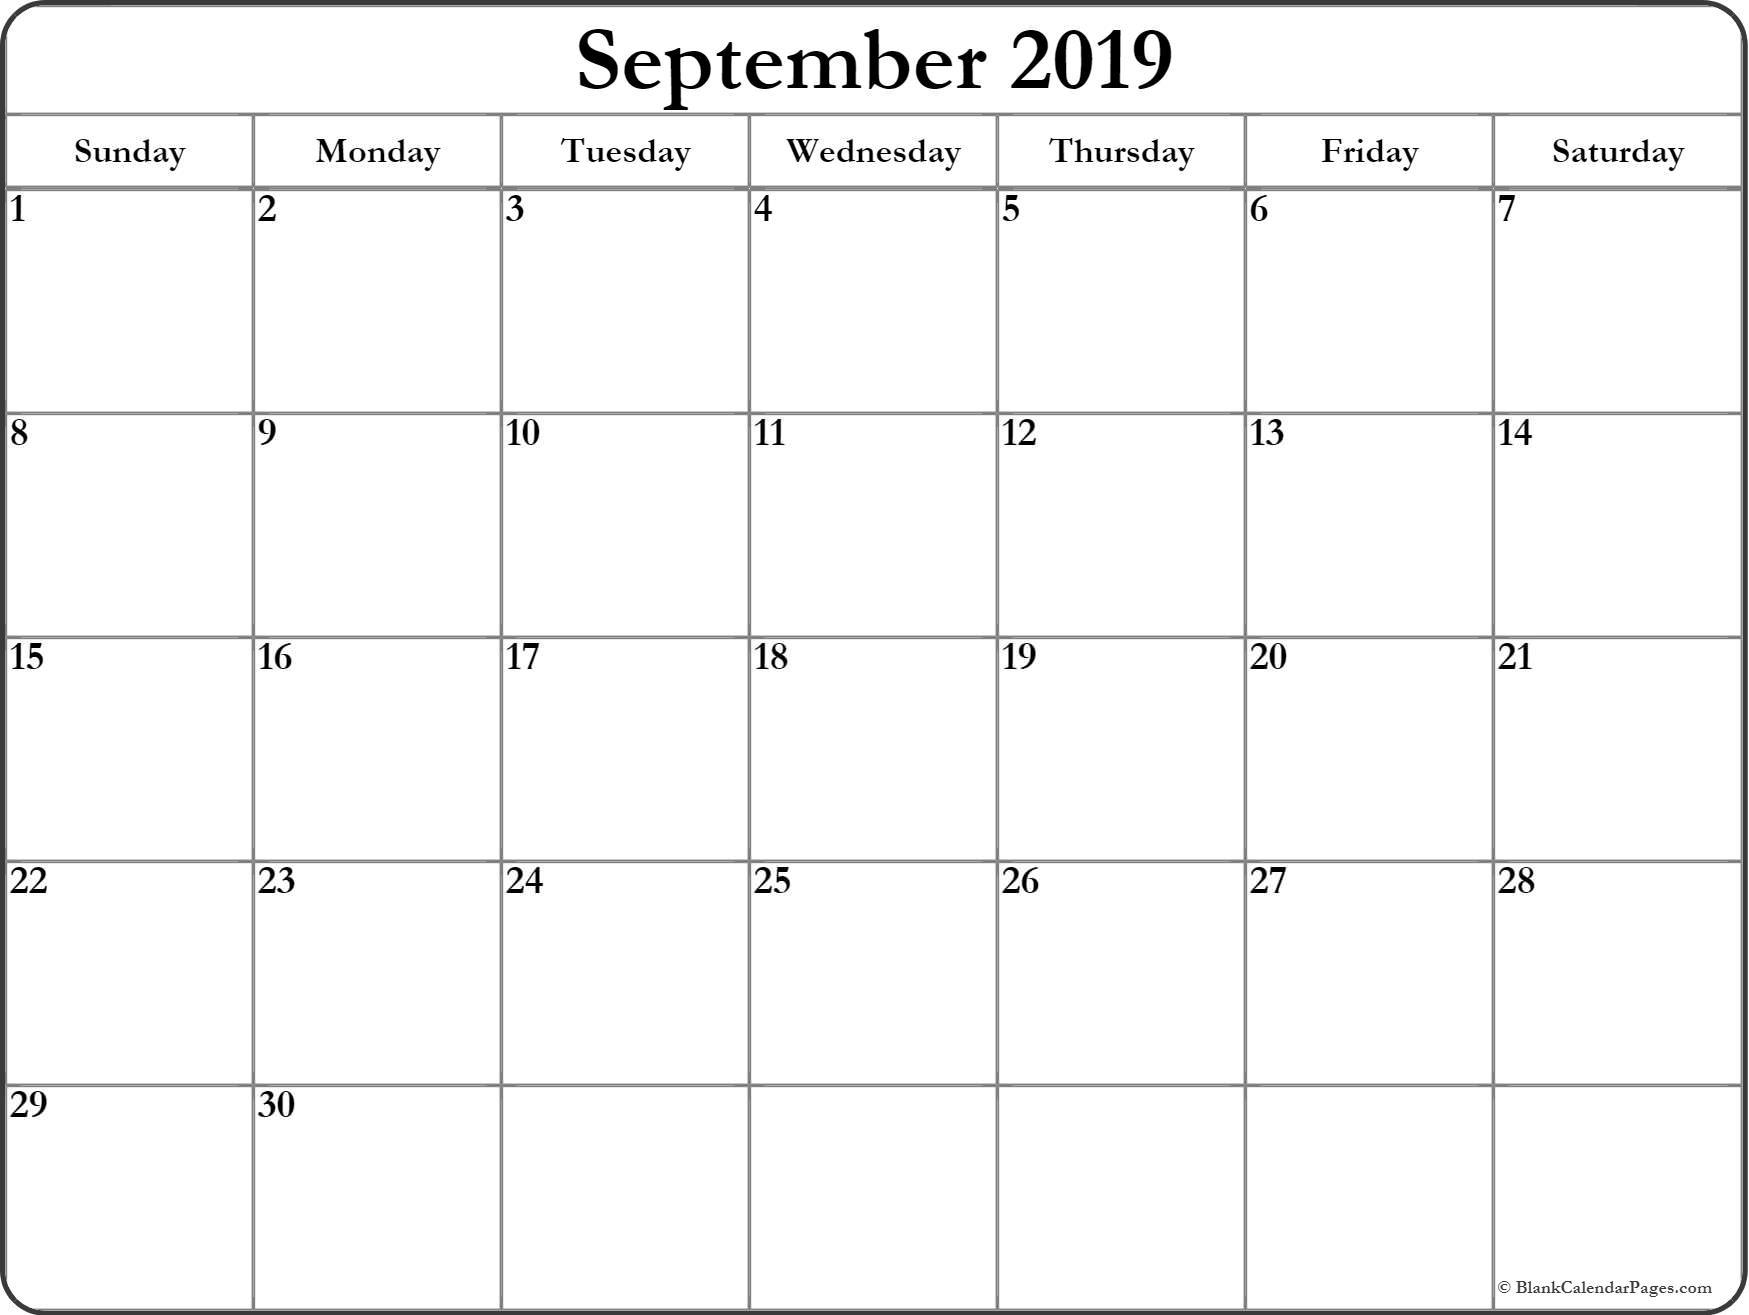 September 2019 Calendar | Free Printable Monthly Calendars inside Blank Calendars Printable September